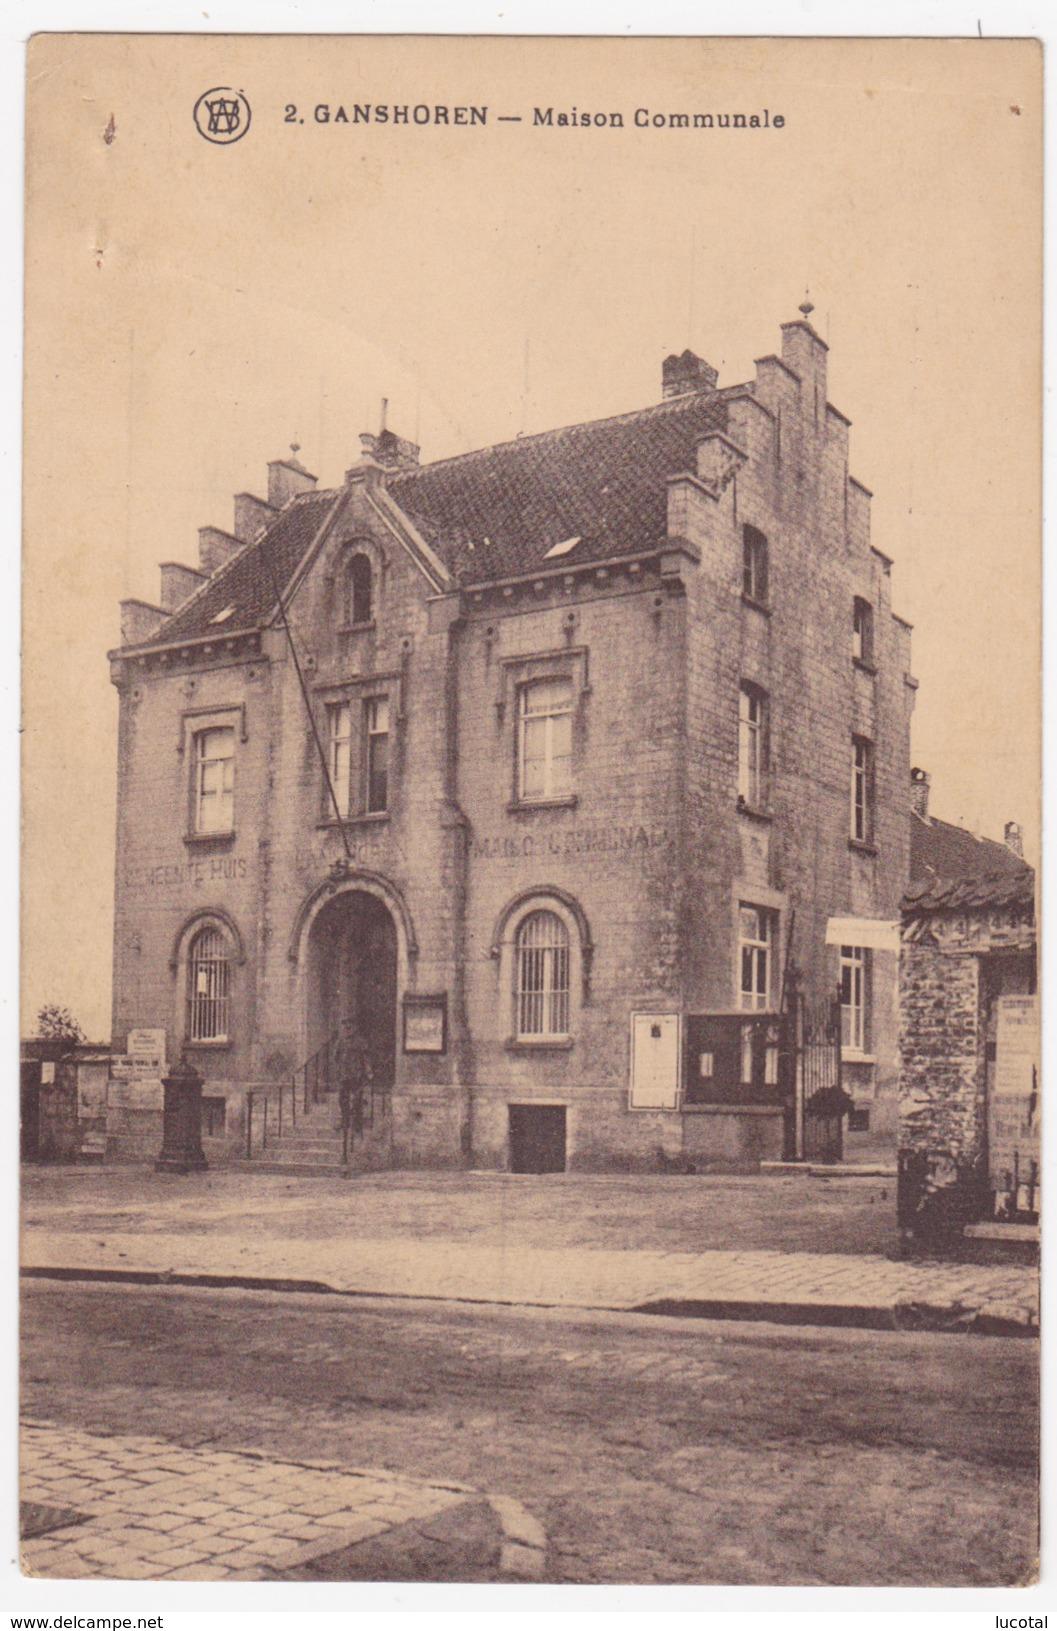 Bruxelles - Ganshoren - Maison Communale - Edit. F. Walschaerts N° 2 - Trous D' Agraffes, Voir Scans - Ganshoren